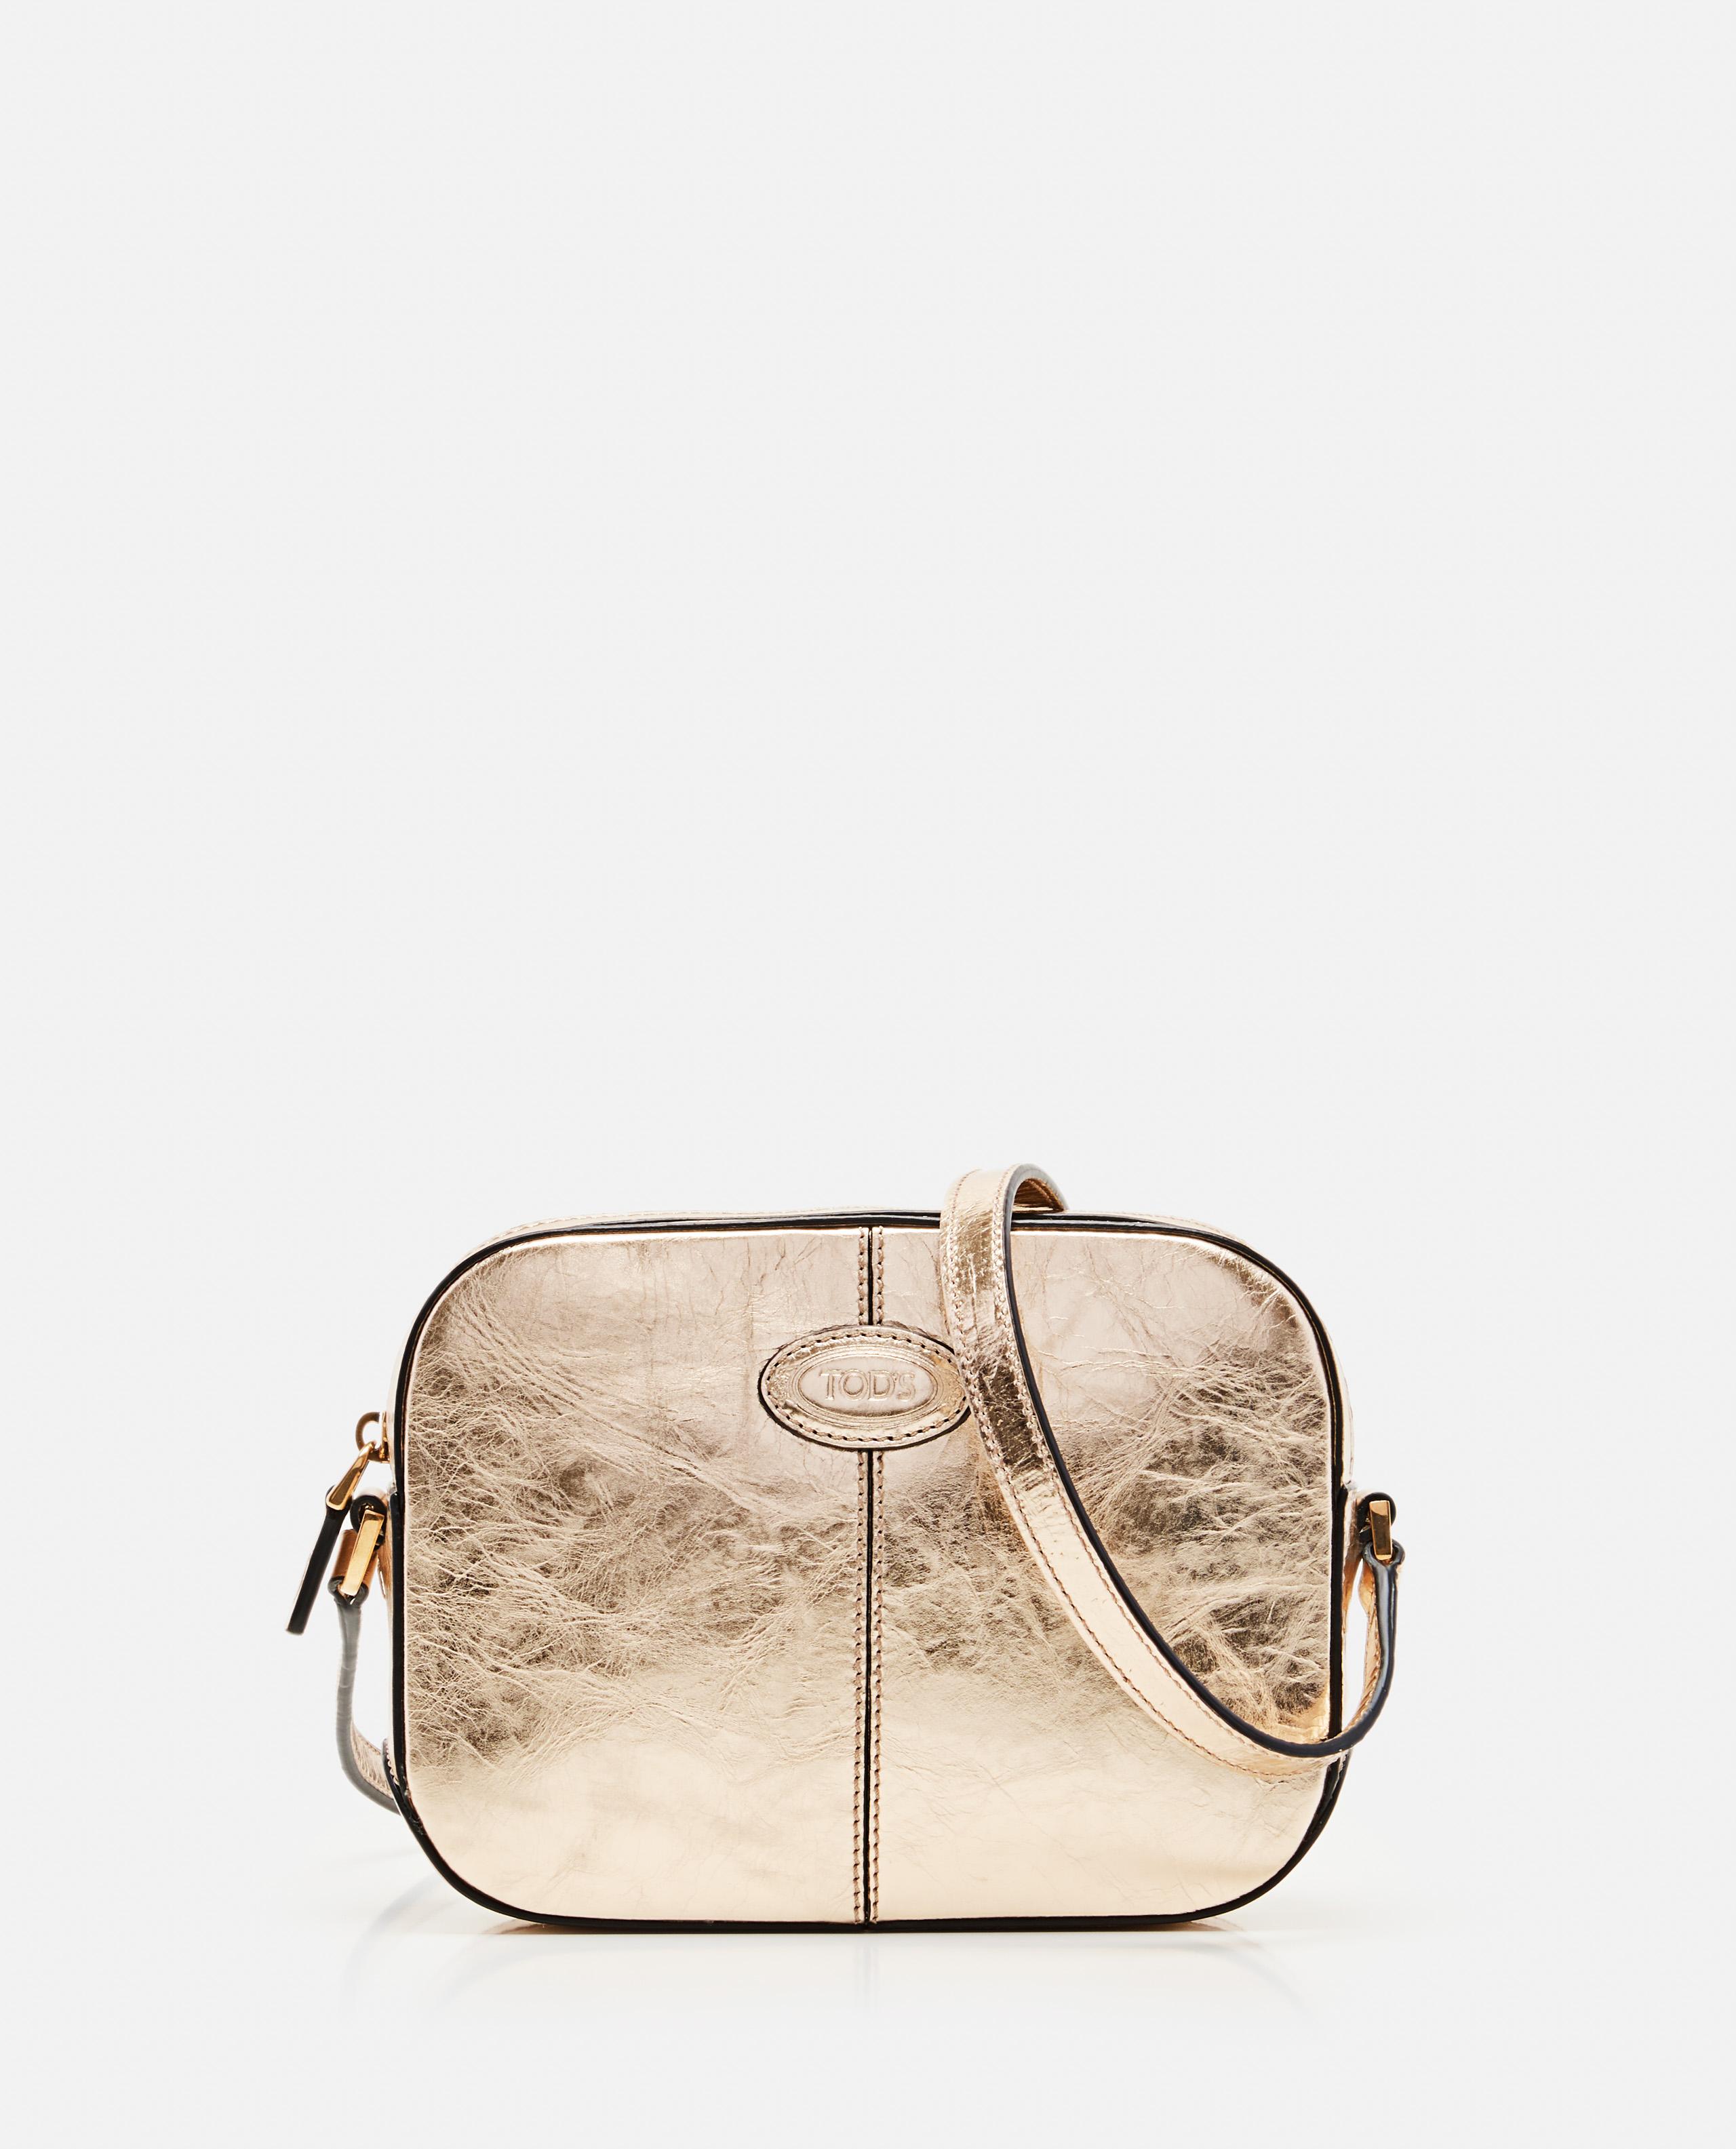 Tods mini golden bag